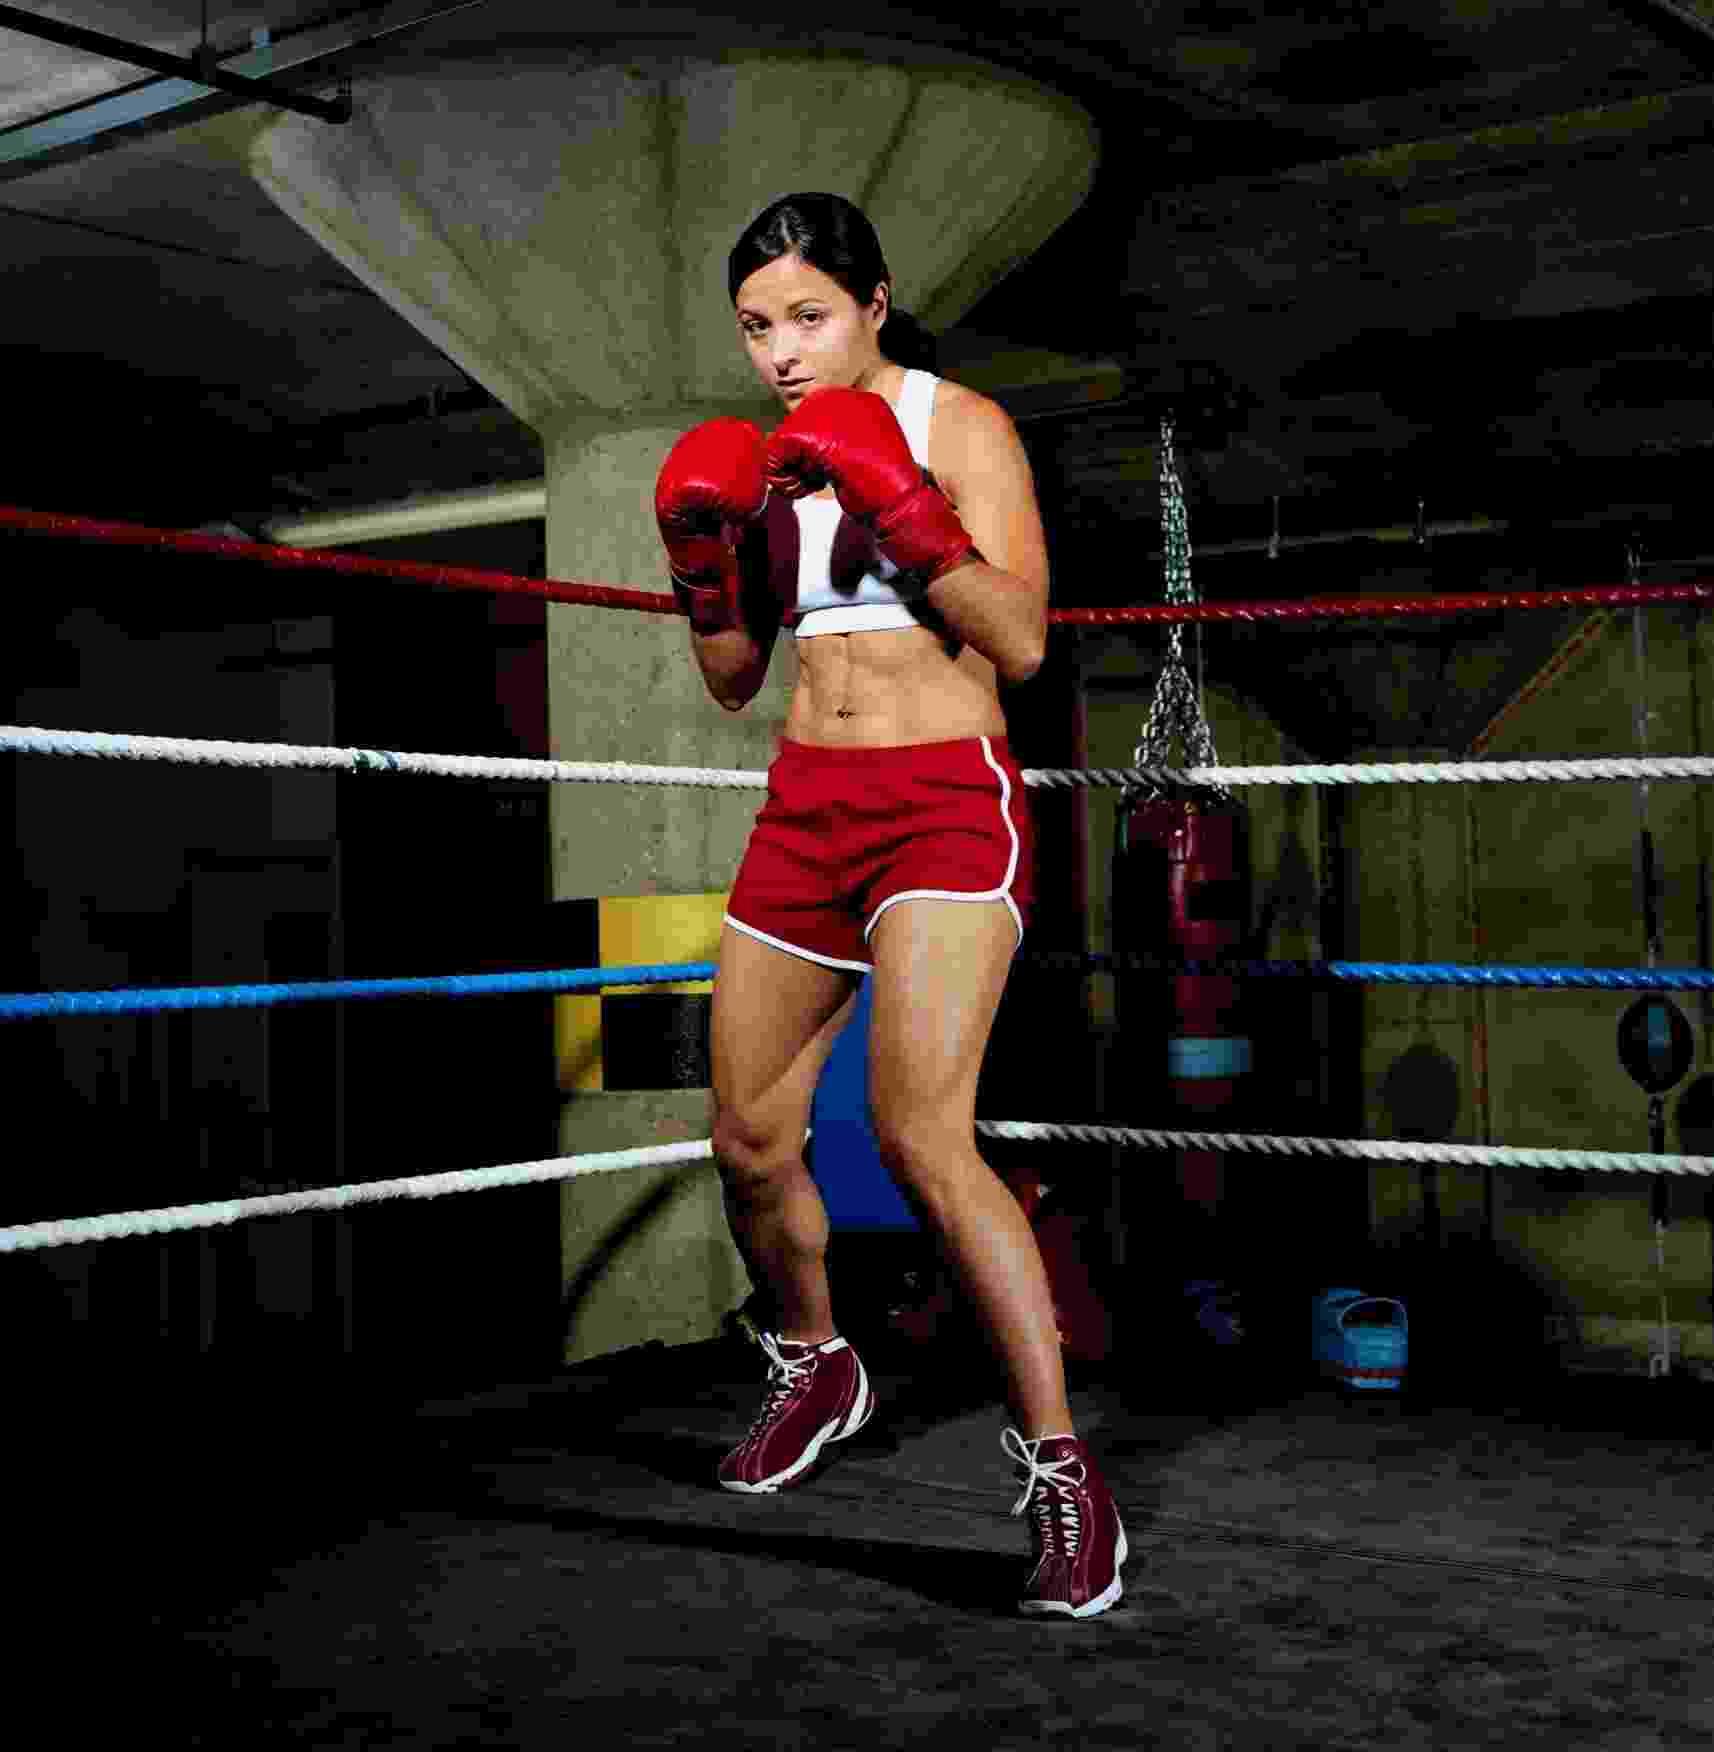 Mulher lutando boxe, artes marciais, mulher lutando - Thinkstock/Getty Images